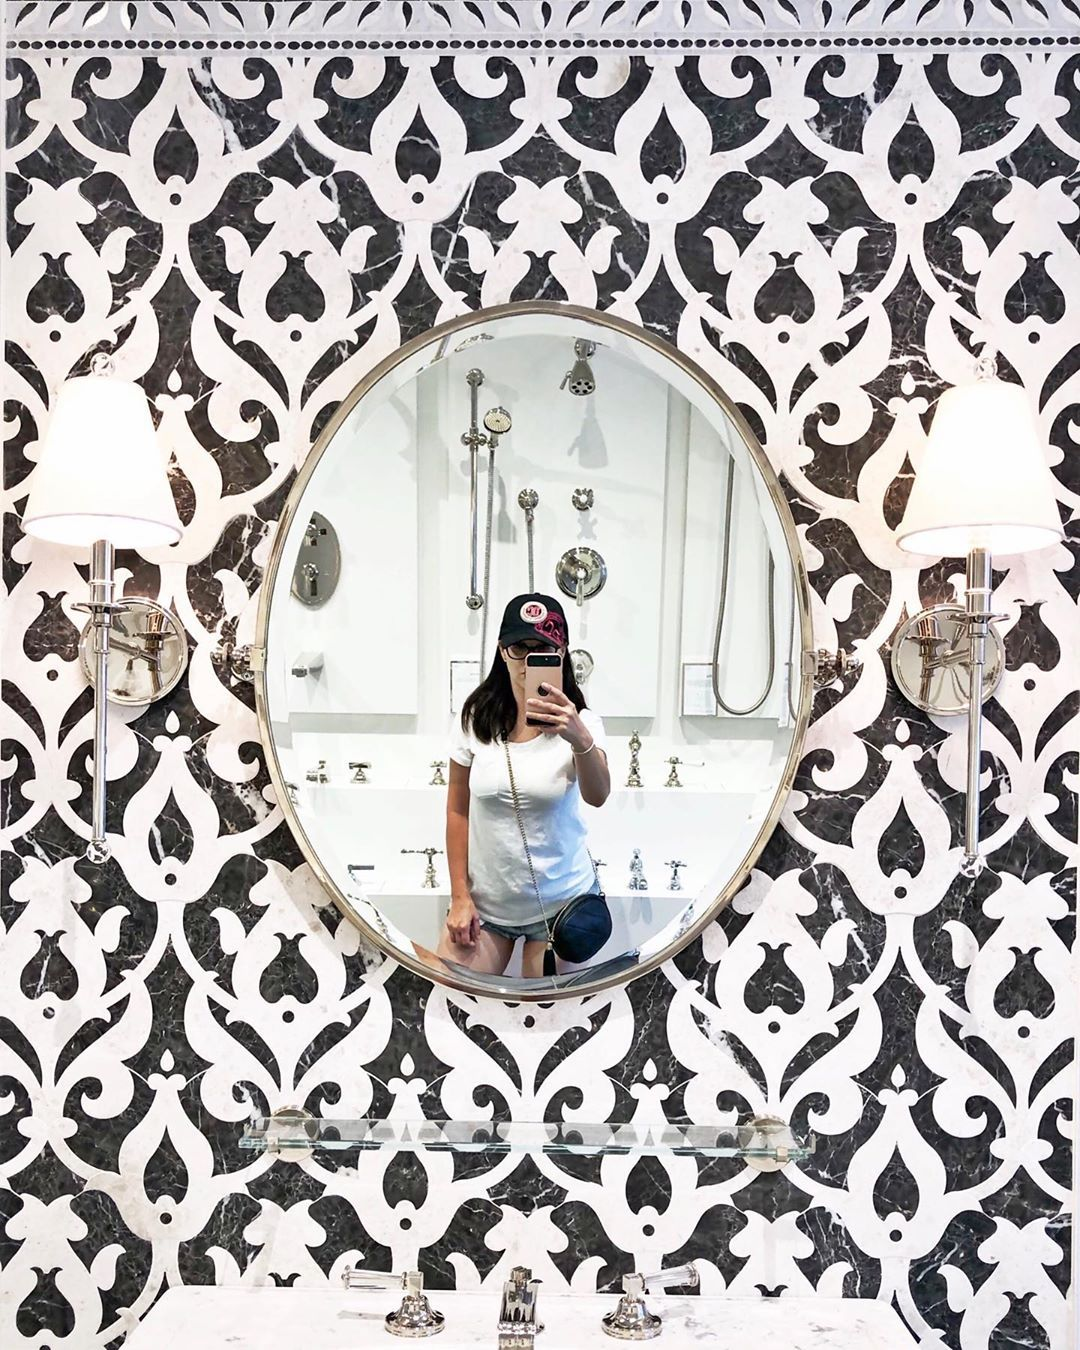 Follow @interior.focused for more! . . . #dream_interiors #finditstyleit #homedecor #homedesign #homeinspiration #homein...#homedecorationlivingroom #homedecorationdiy #homedecorationdesign #homedecorationflowers #homedecorationcheap #homedecorationproducts #homedecorationonabudget #homedecorationwithwood #homedecorationideas #homedecorationbedroom #homedecorationkitchen #modernhomedecoration #homedecorationrustic #cozyhomedecoration #homedecorationvintage #homedecoronabudget #homedecorapartment